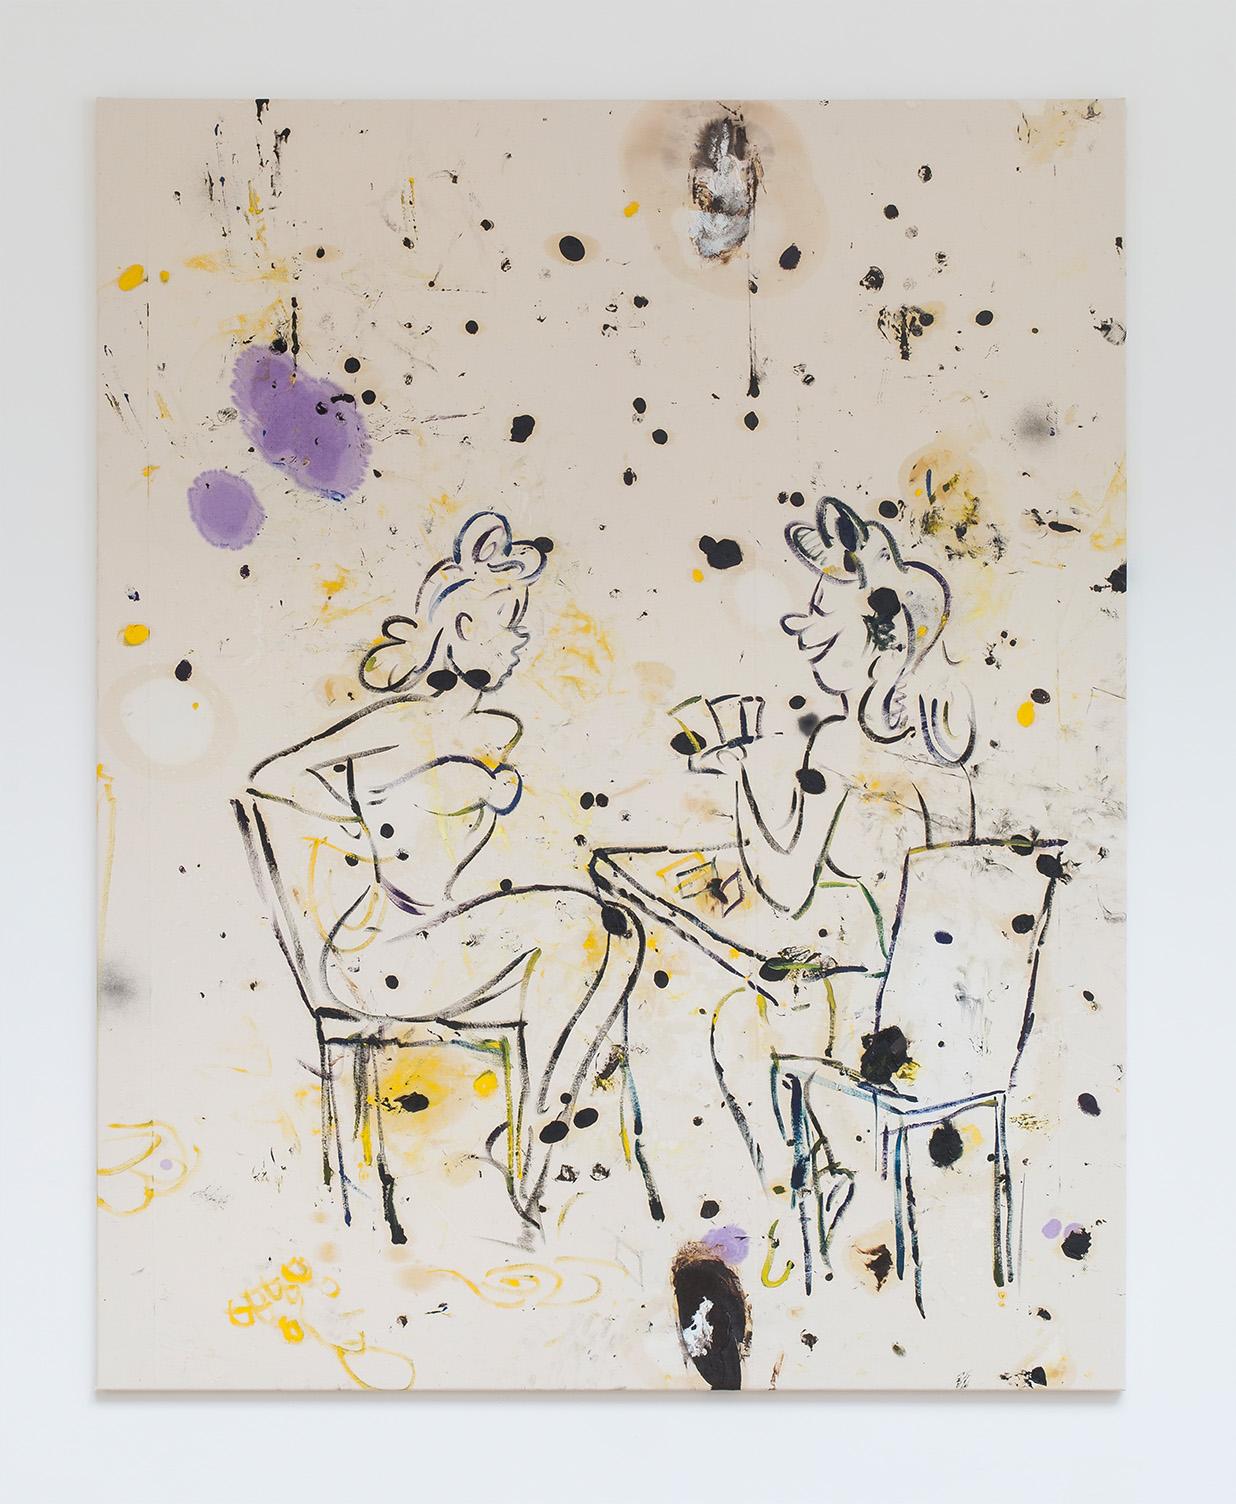 Razvan Boar, Candy drink, oil and spray paint on canvas, 217x169 cm, 2015, courtesy Ibid Galerry and Razvan Boar